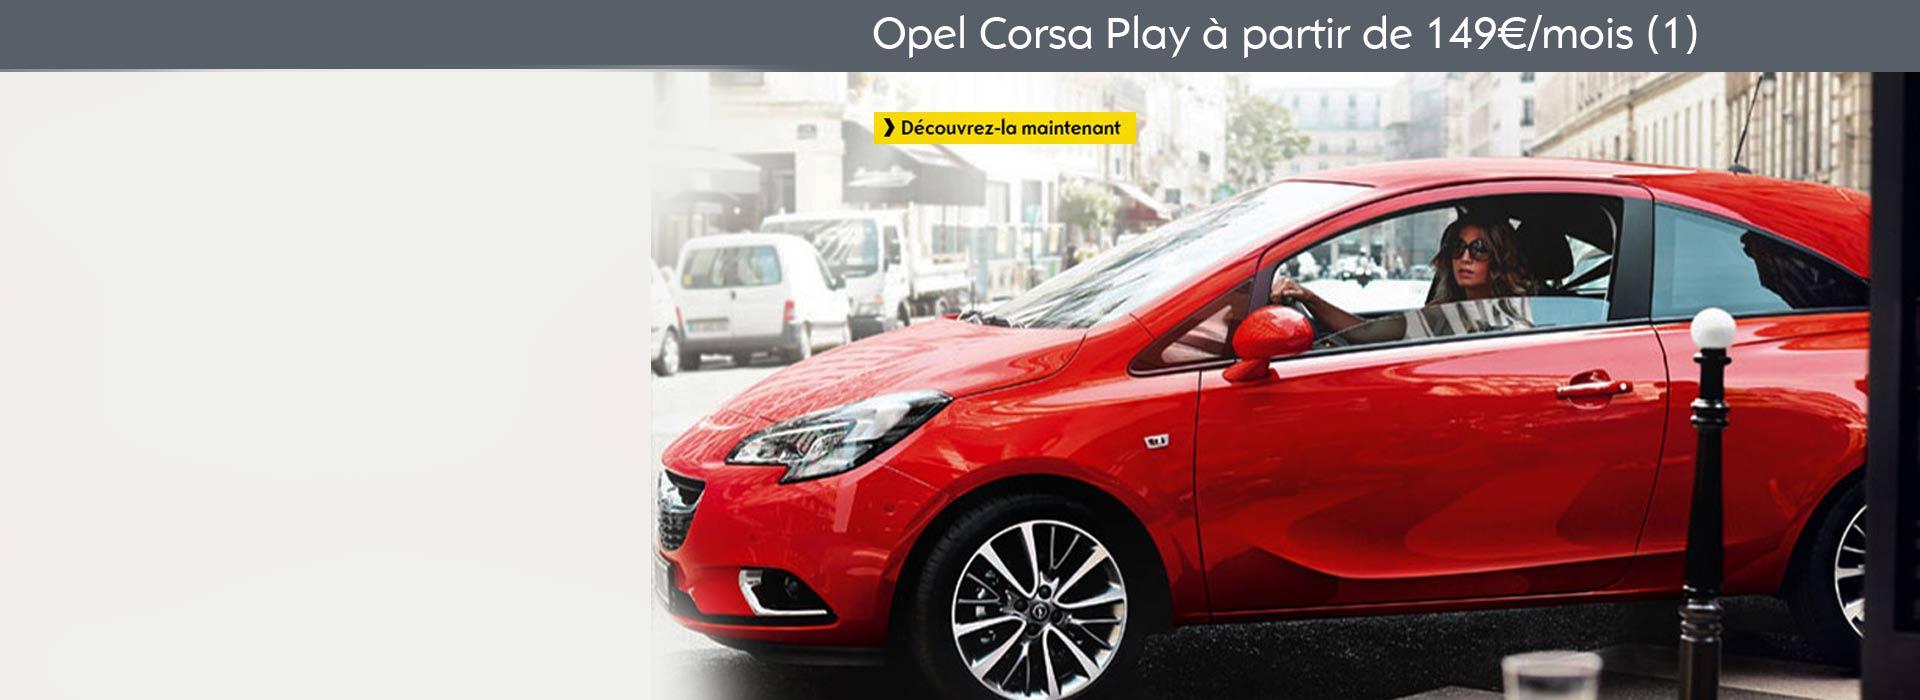 Opel Corsa Play